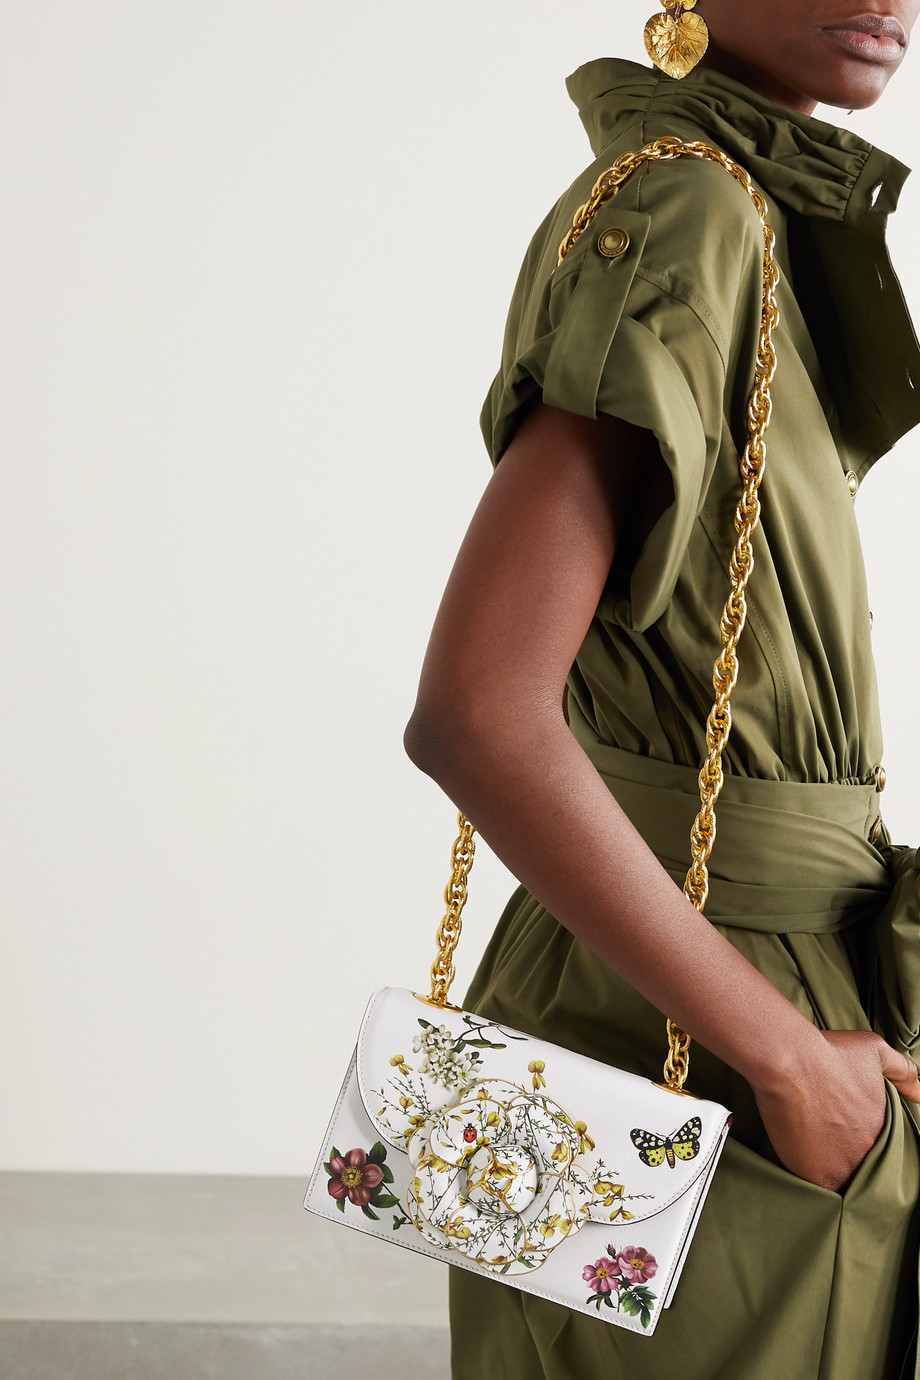 Oscar de la Renta Alibi printed textured-leather shoulder bag